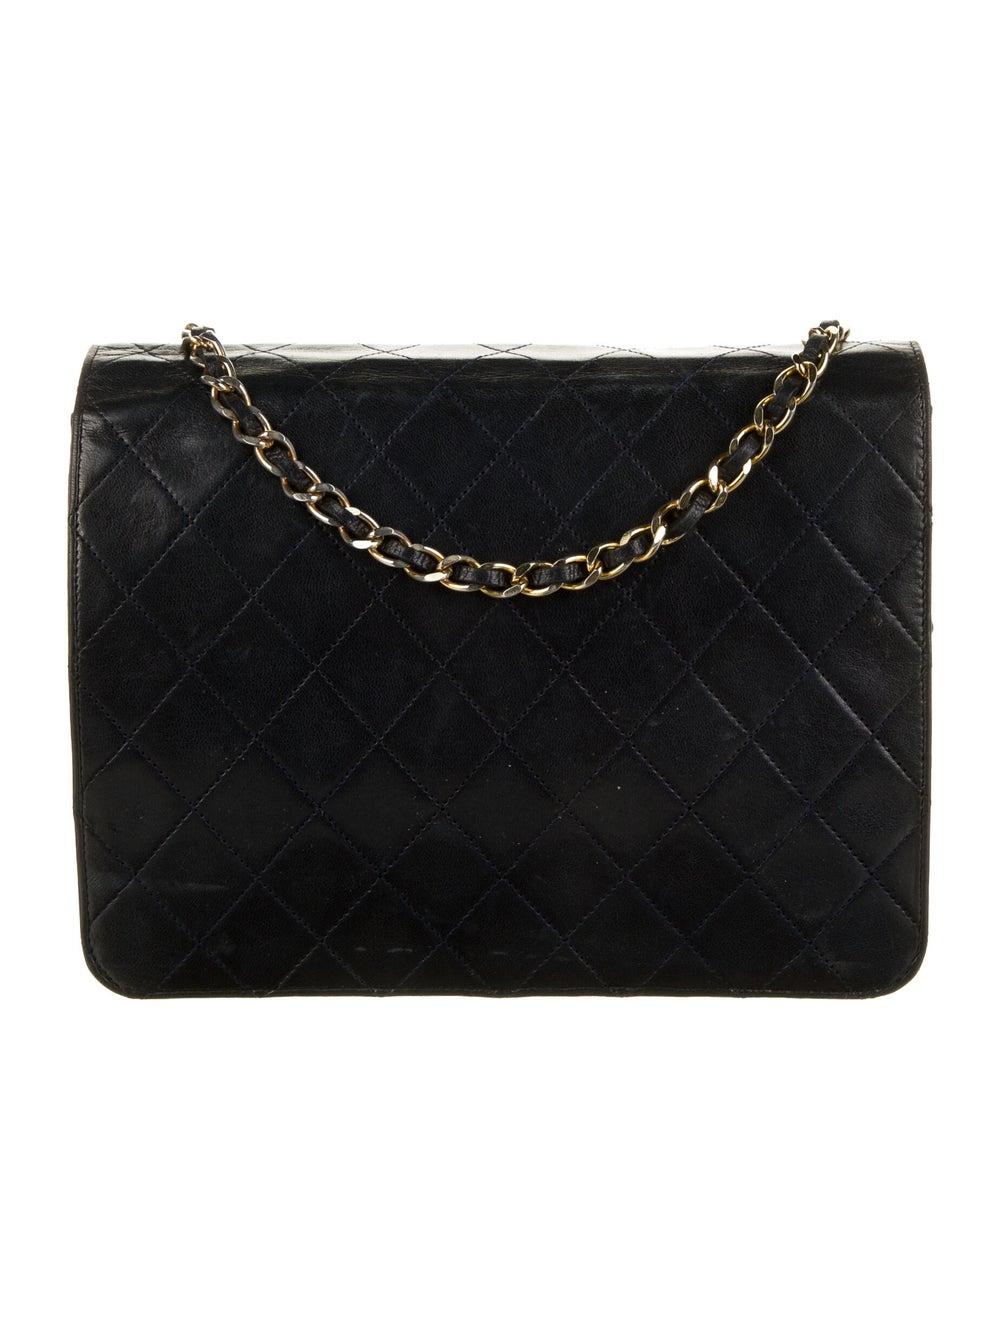 Chanel Vintage Classic Single Flap Bag Blue - image 4